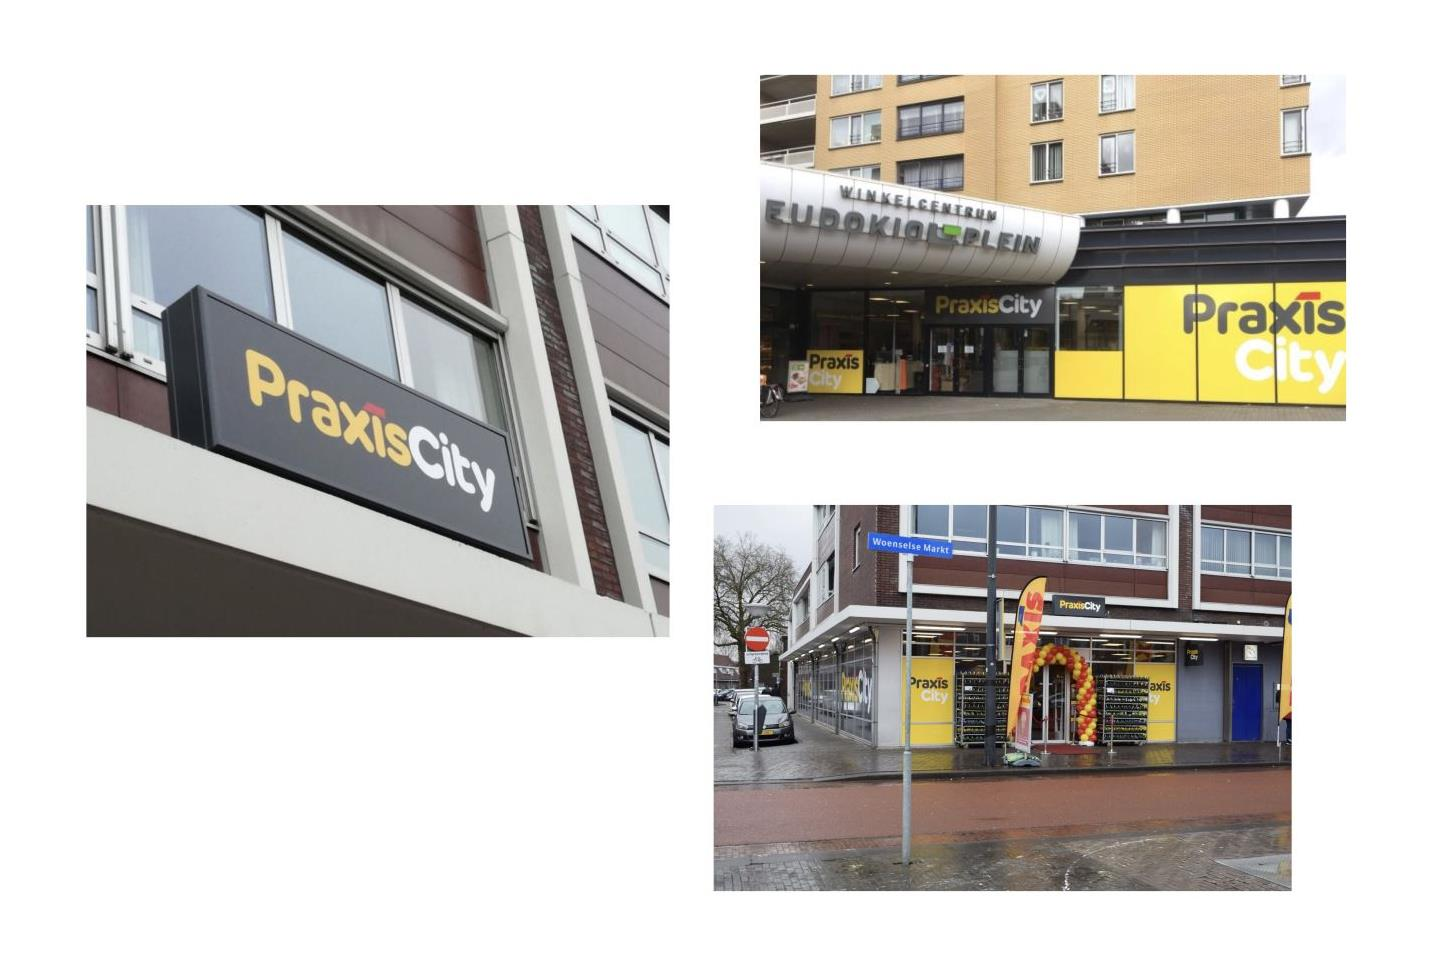 493492a0b51 Praxis City opent in Eindhoven, Nijmegen, Rotterdam en Utrecht!